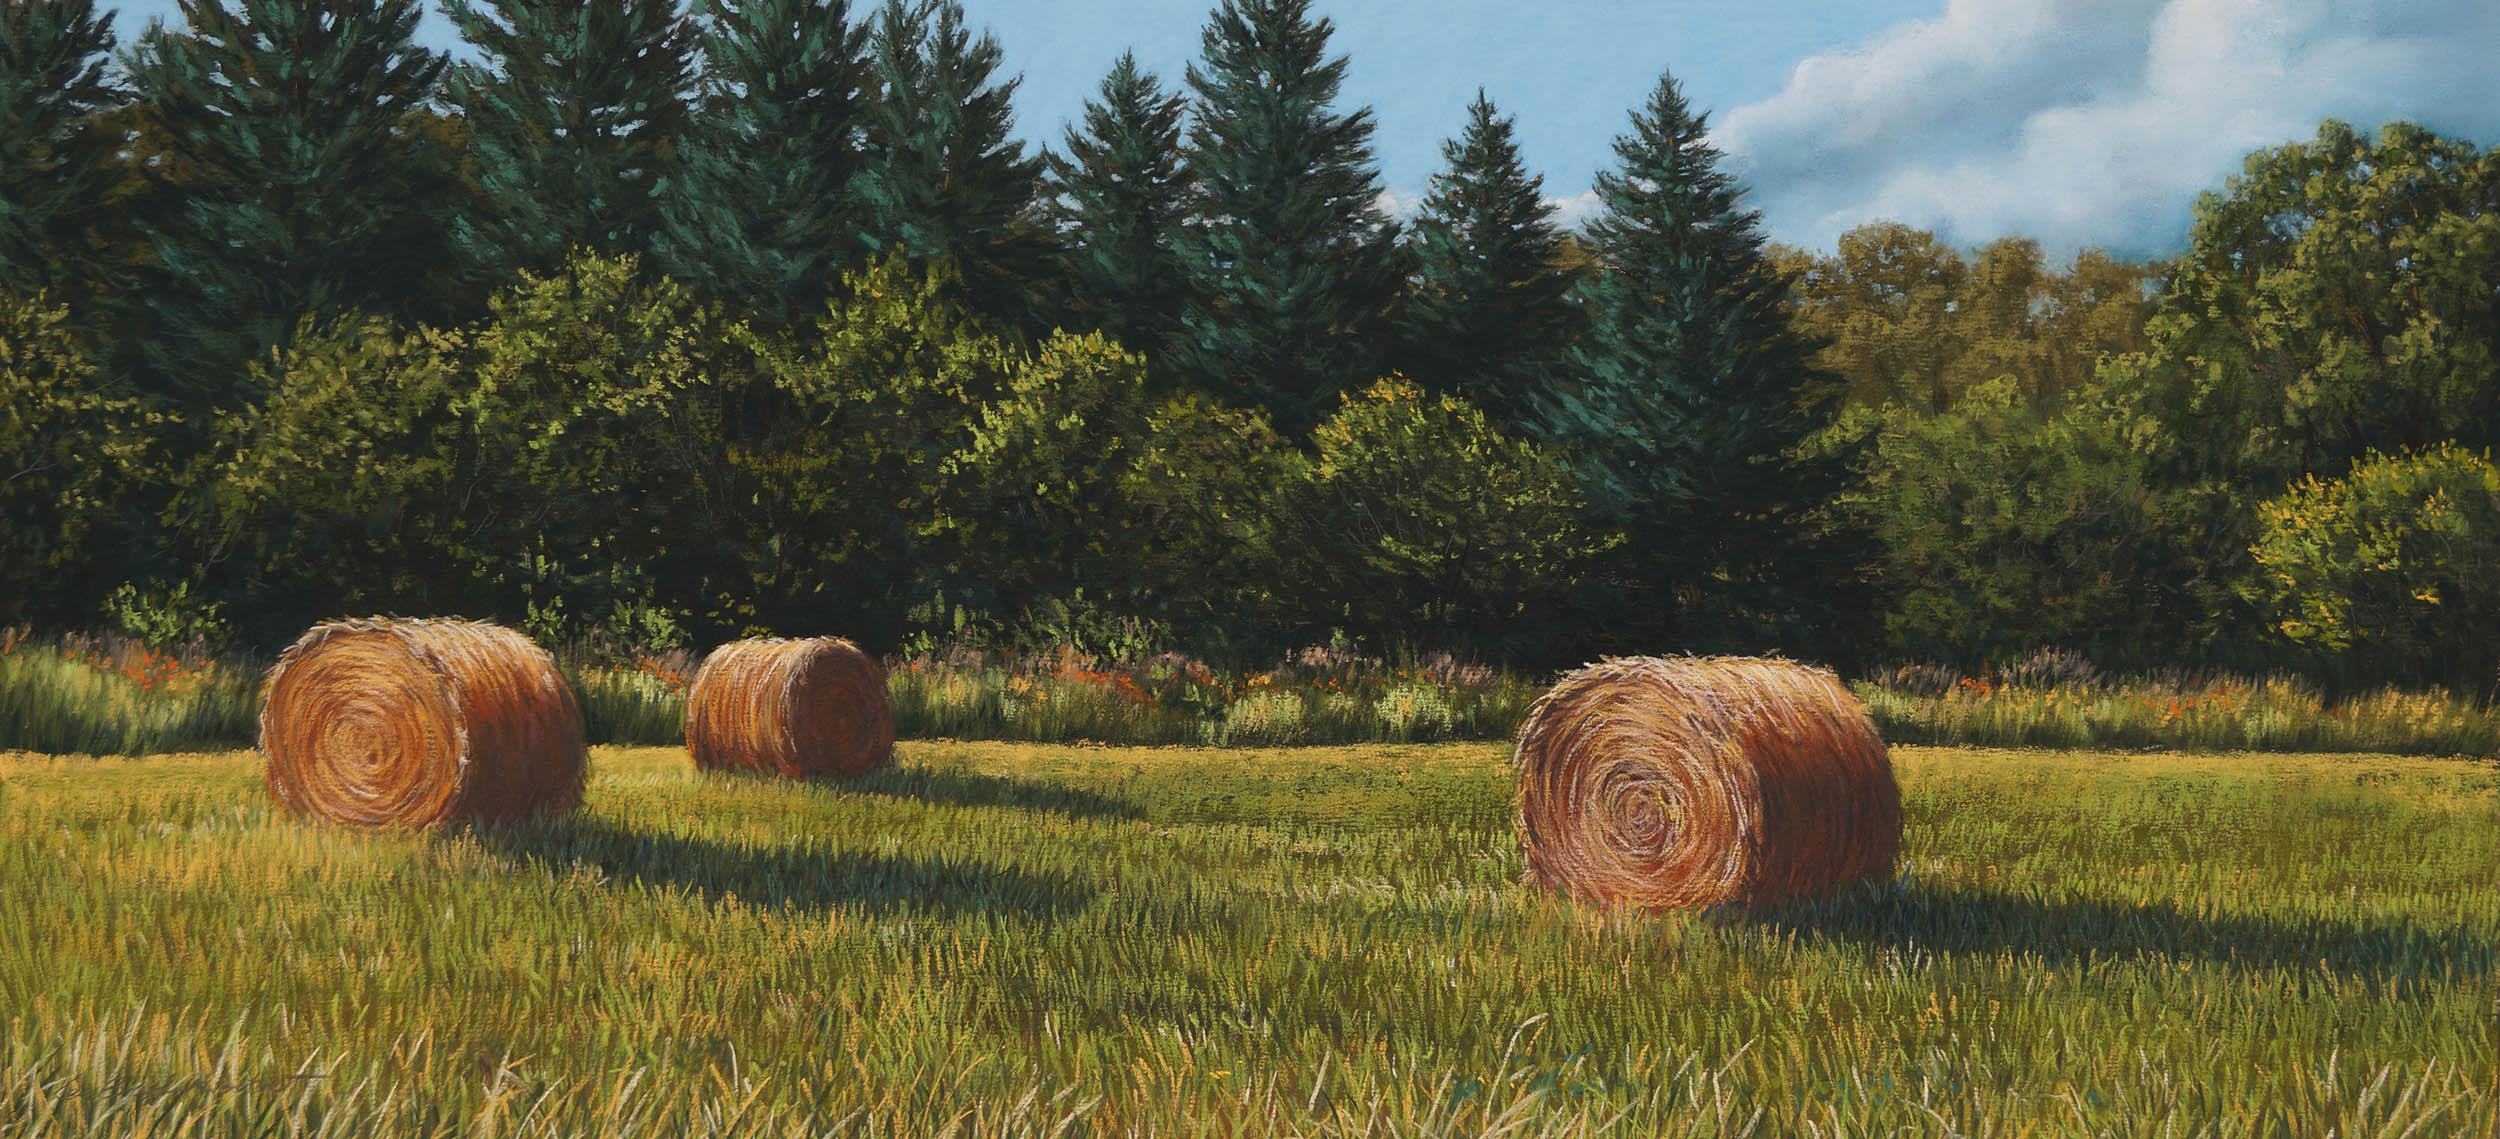 Northwoods Hay